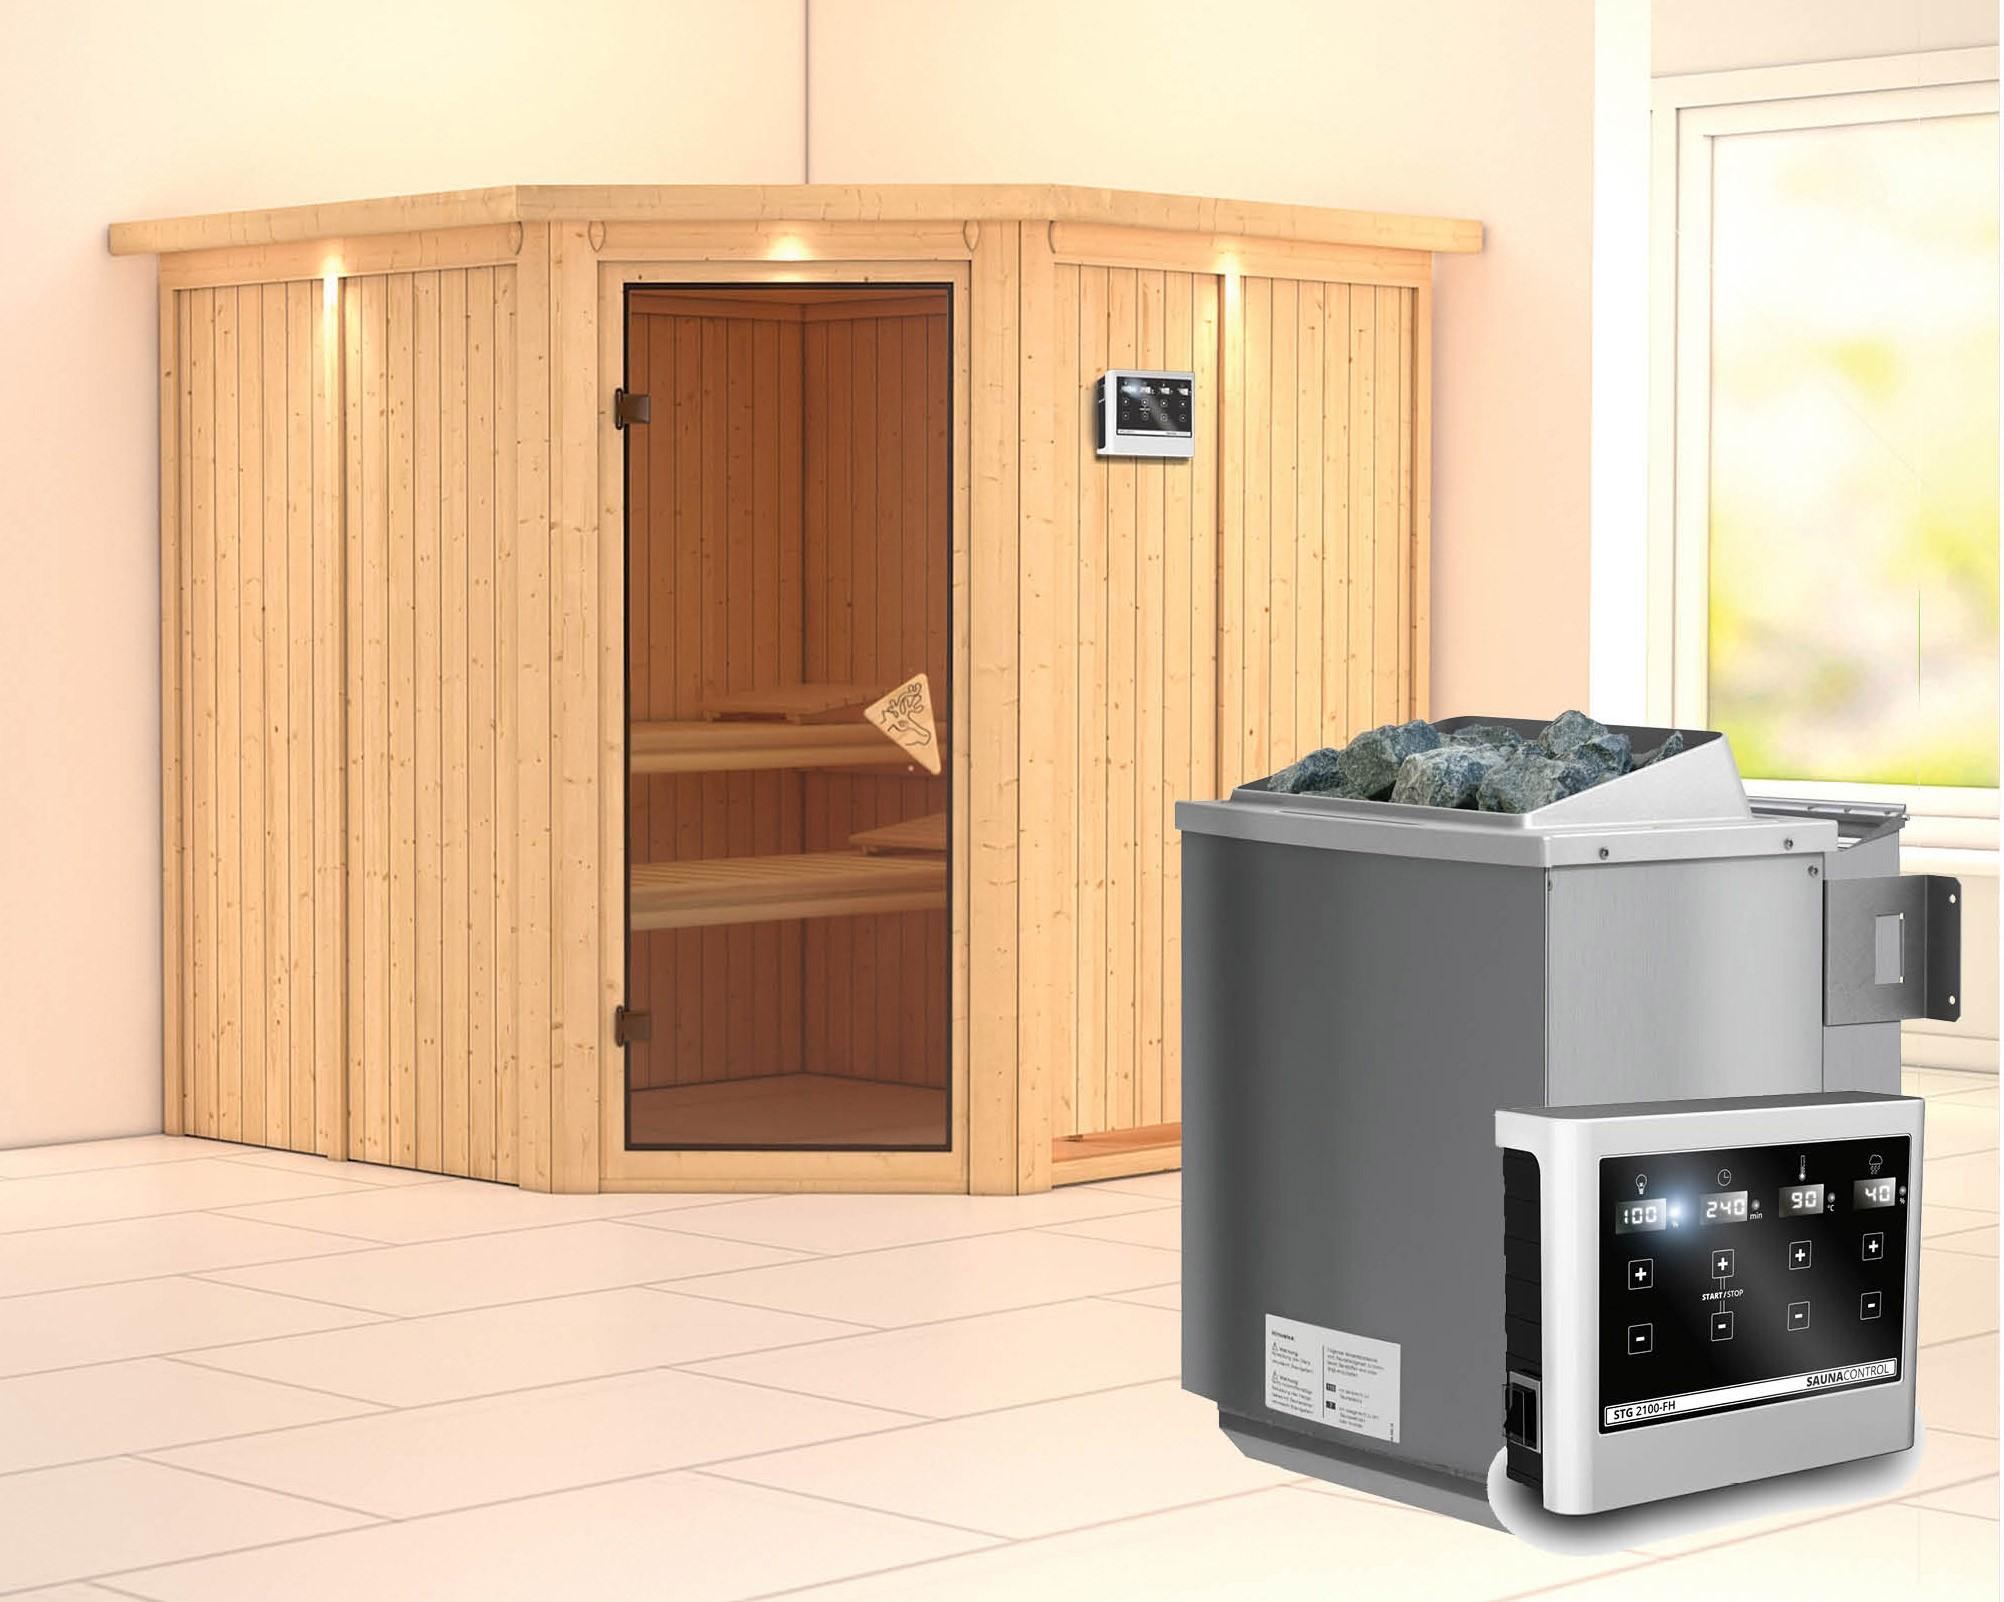 Karibu Sauna Jarin 68mm Dachkranz + Bio Ofen 9kW extern classic Tür Bild 1